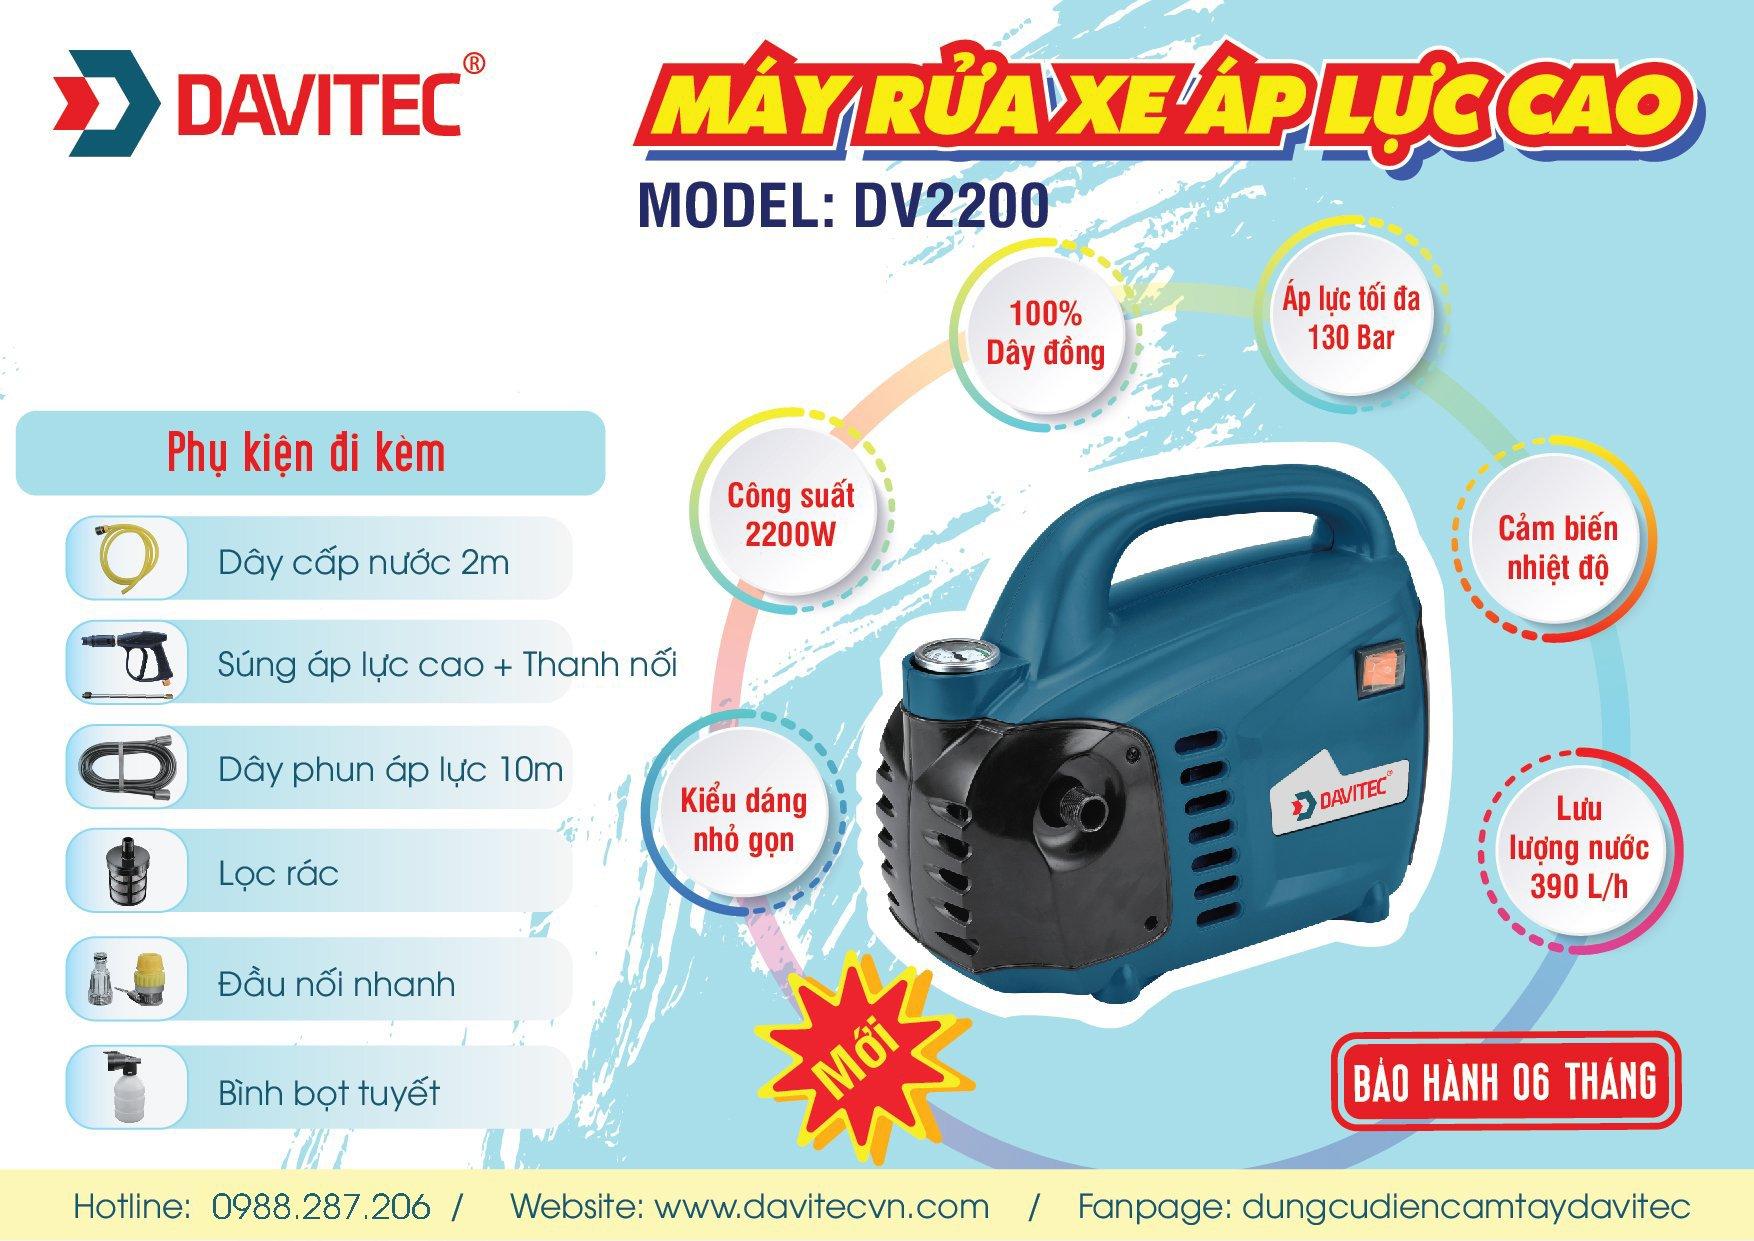 DV2200 - Máy rửa xe áp lực cao